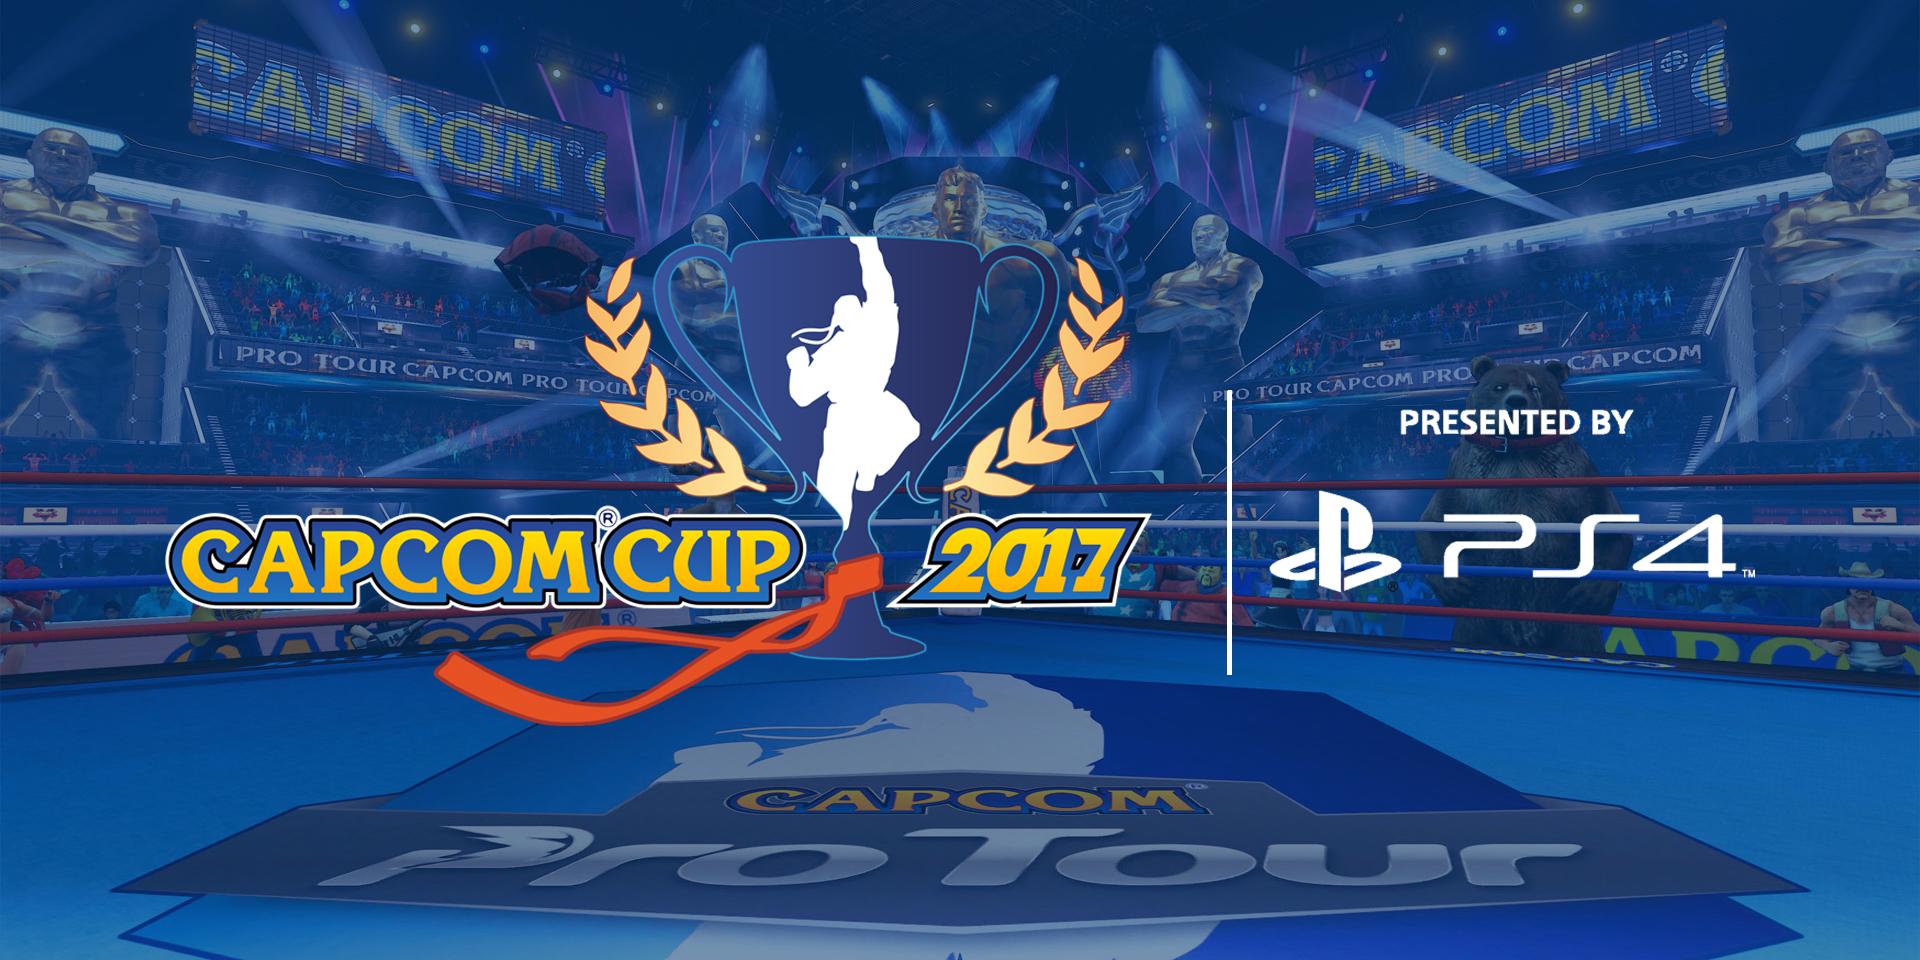 NuckleDu no participará en la Capcom Cup 2017